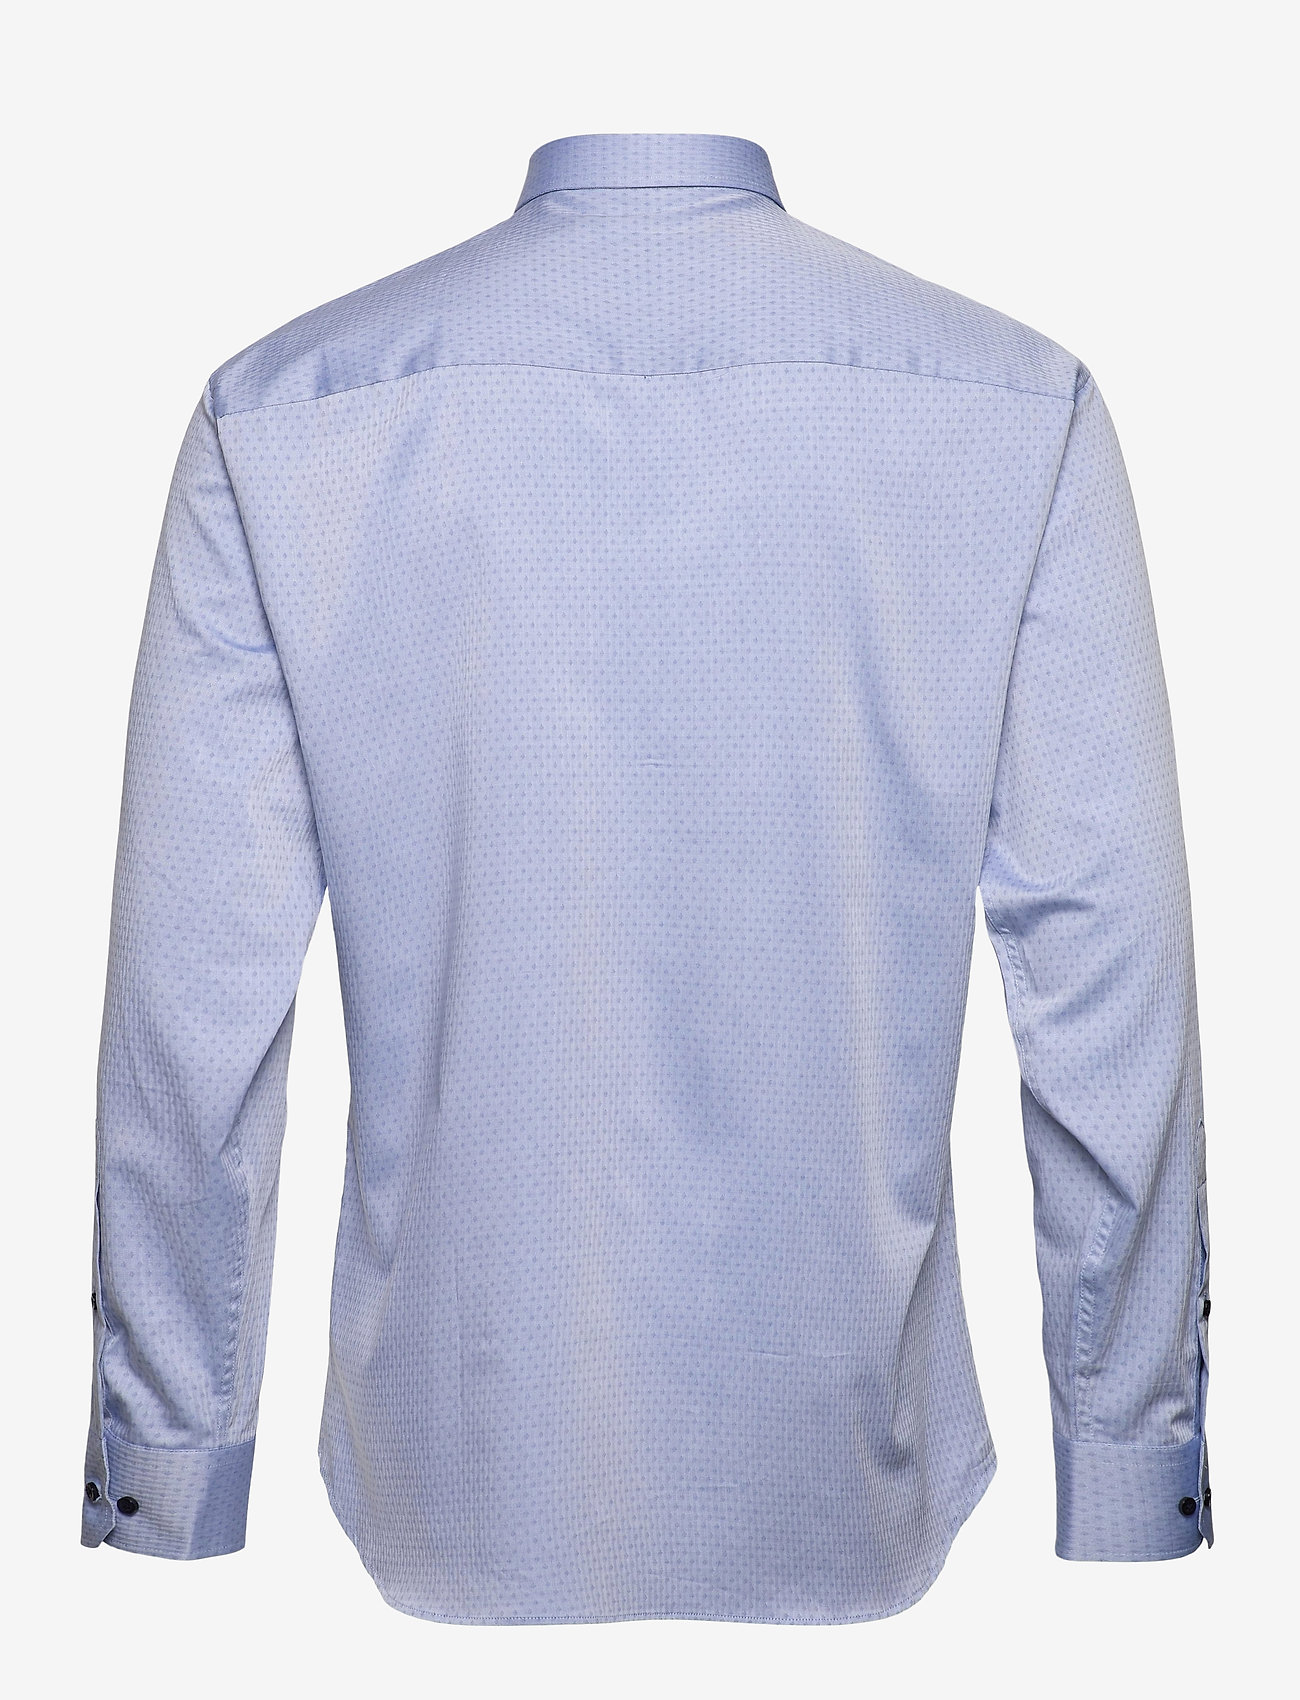 Bosweel Shirts Est. 1937 - Modern fit - chemises d'affaires - light blue - 1